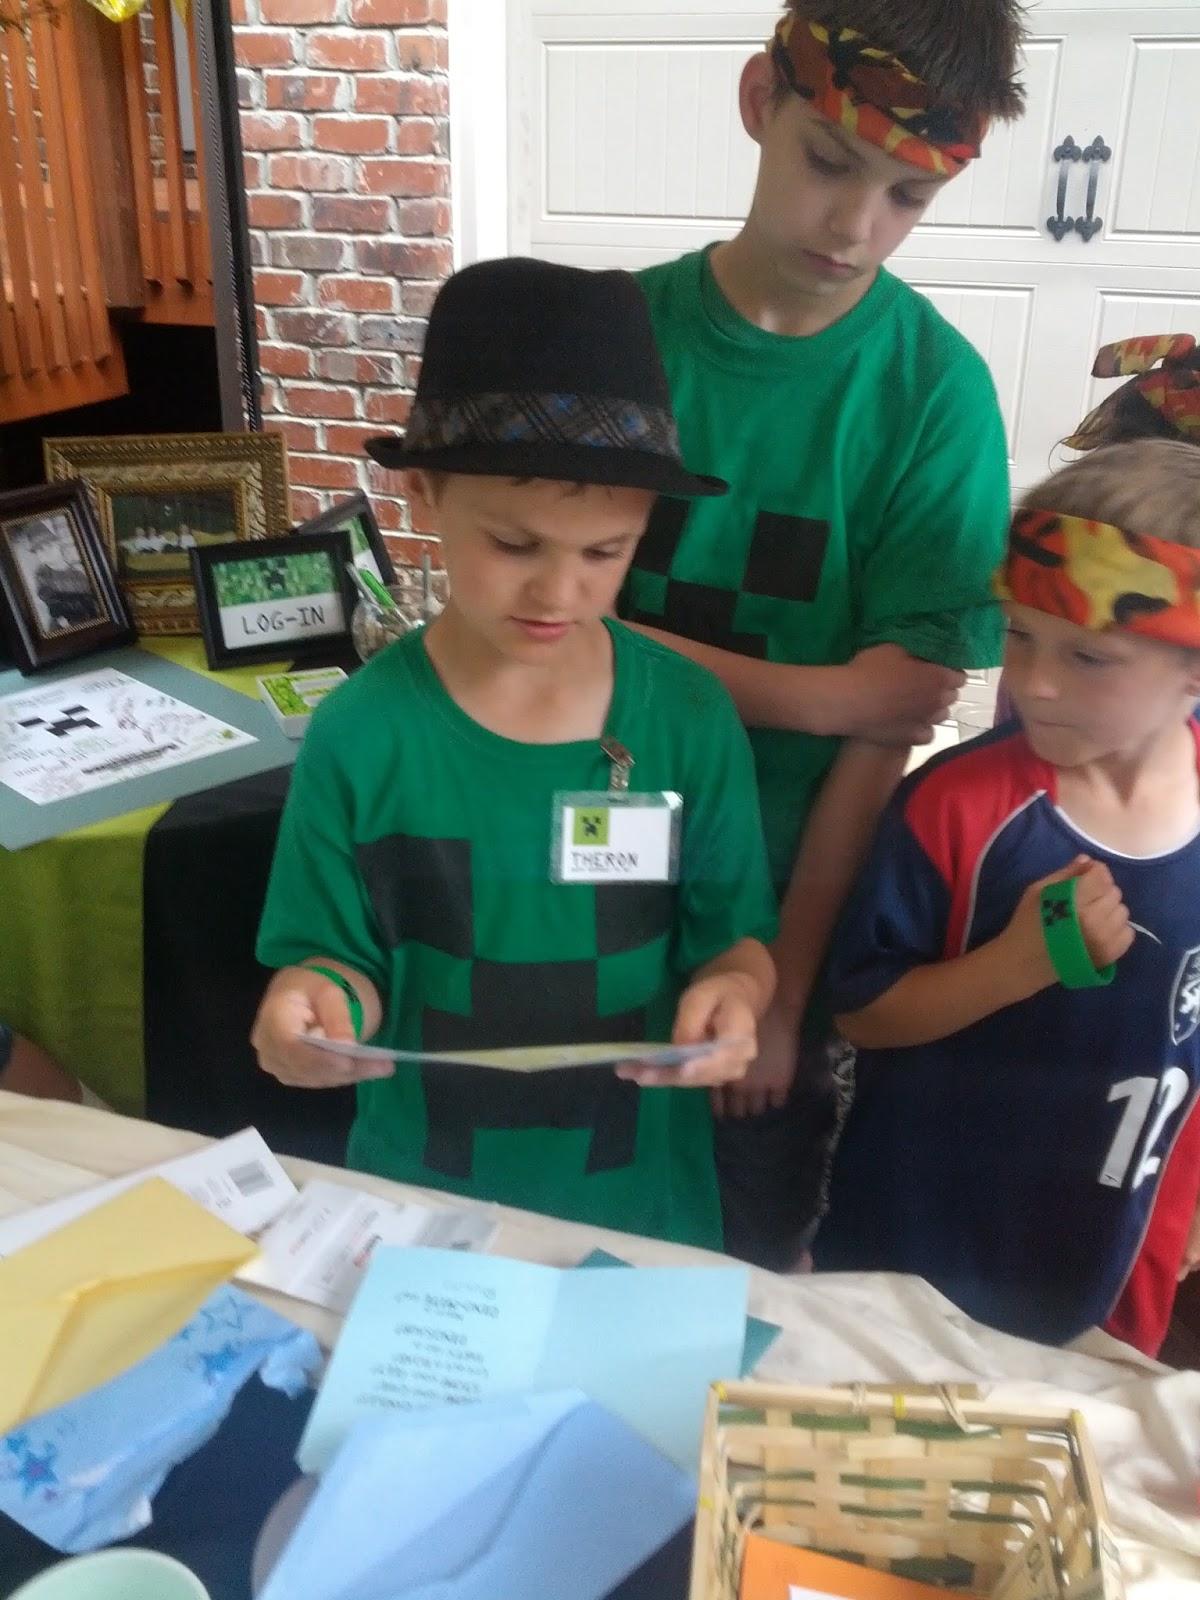 Minecraft Birthday Party Ideas and Invitations! By 3.bp.blogspot.com